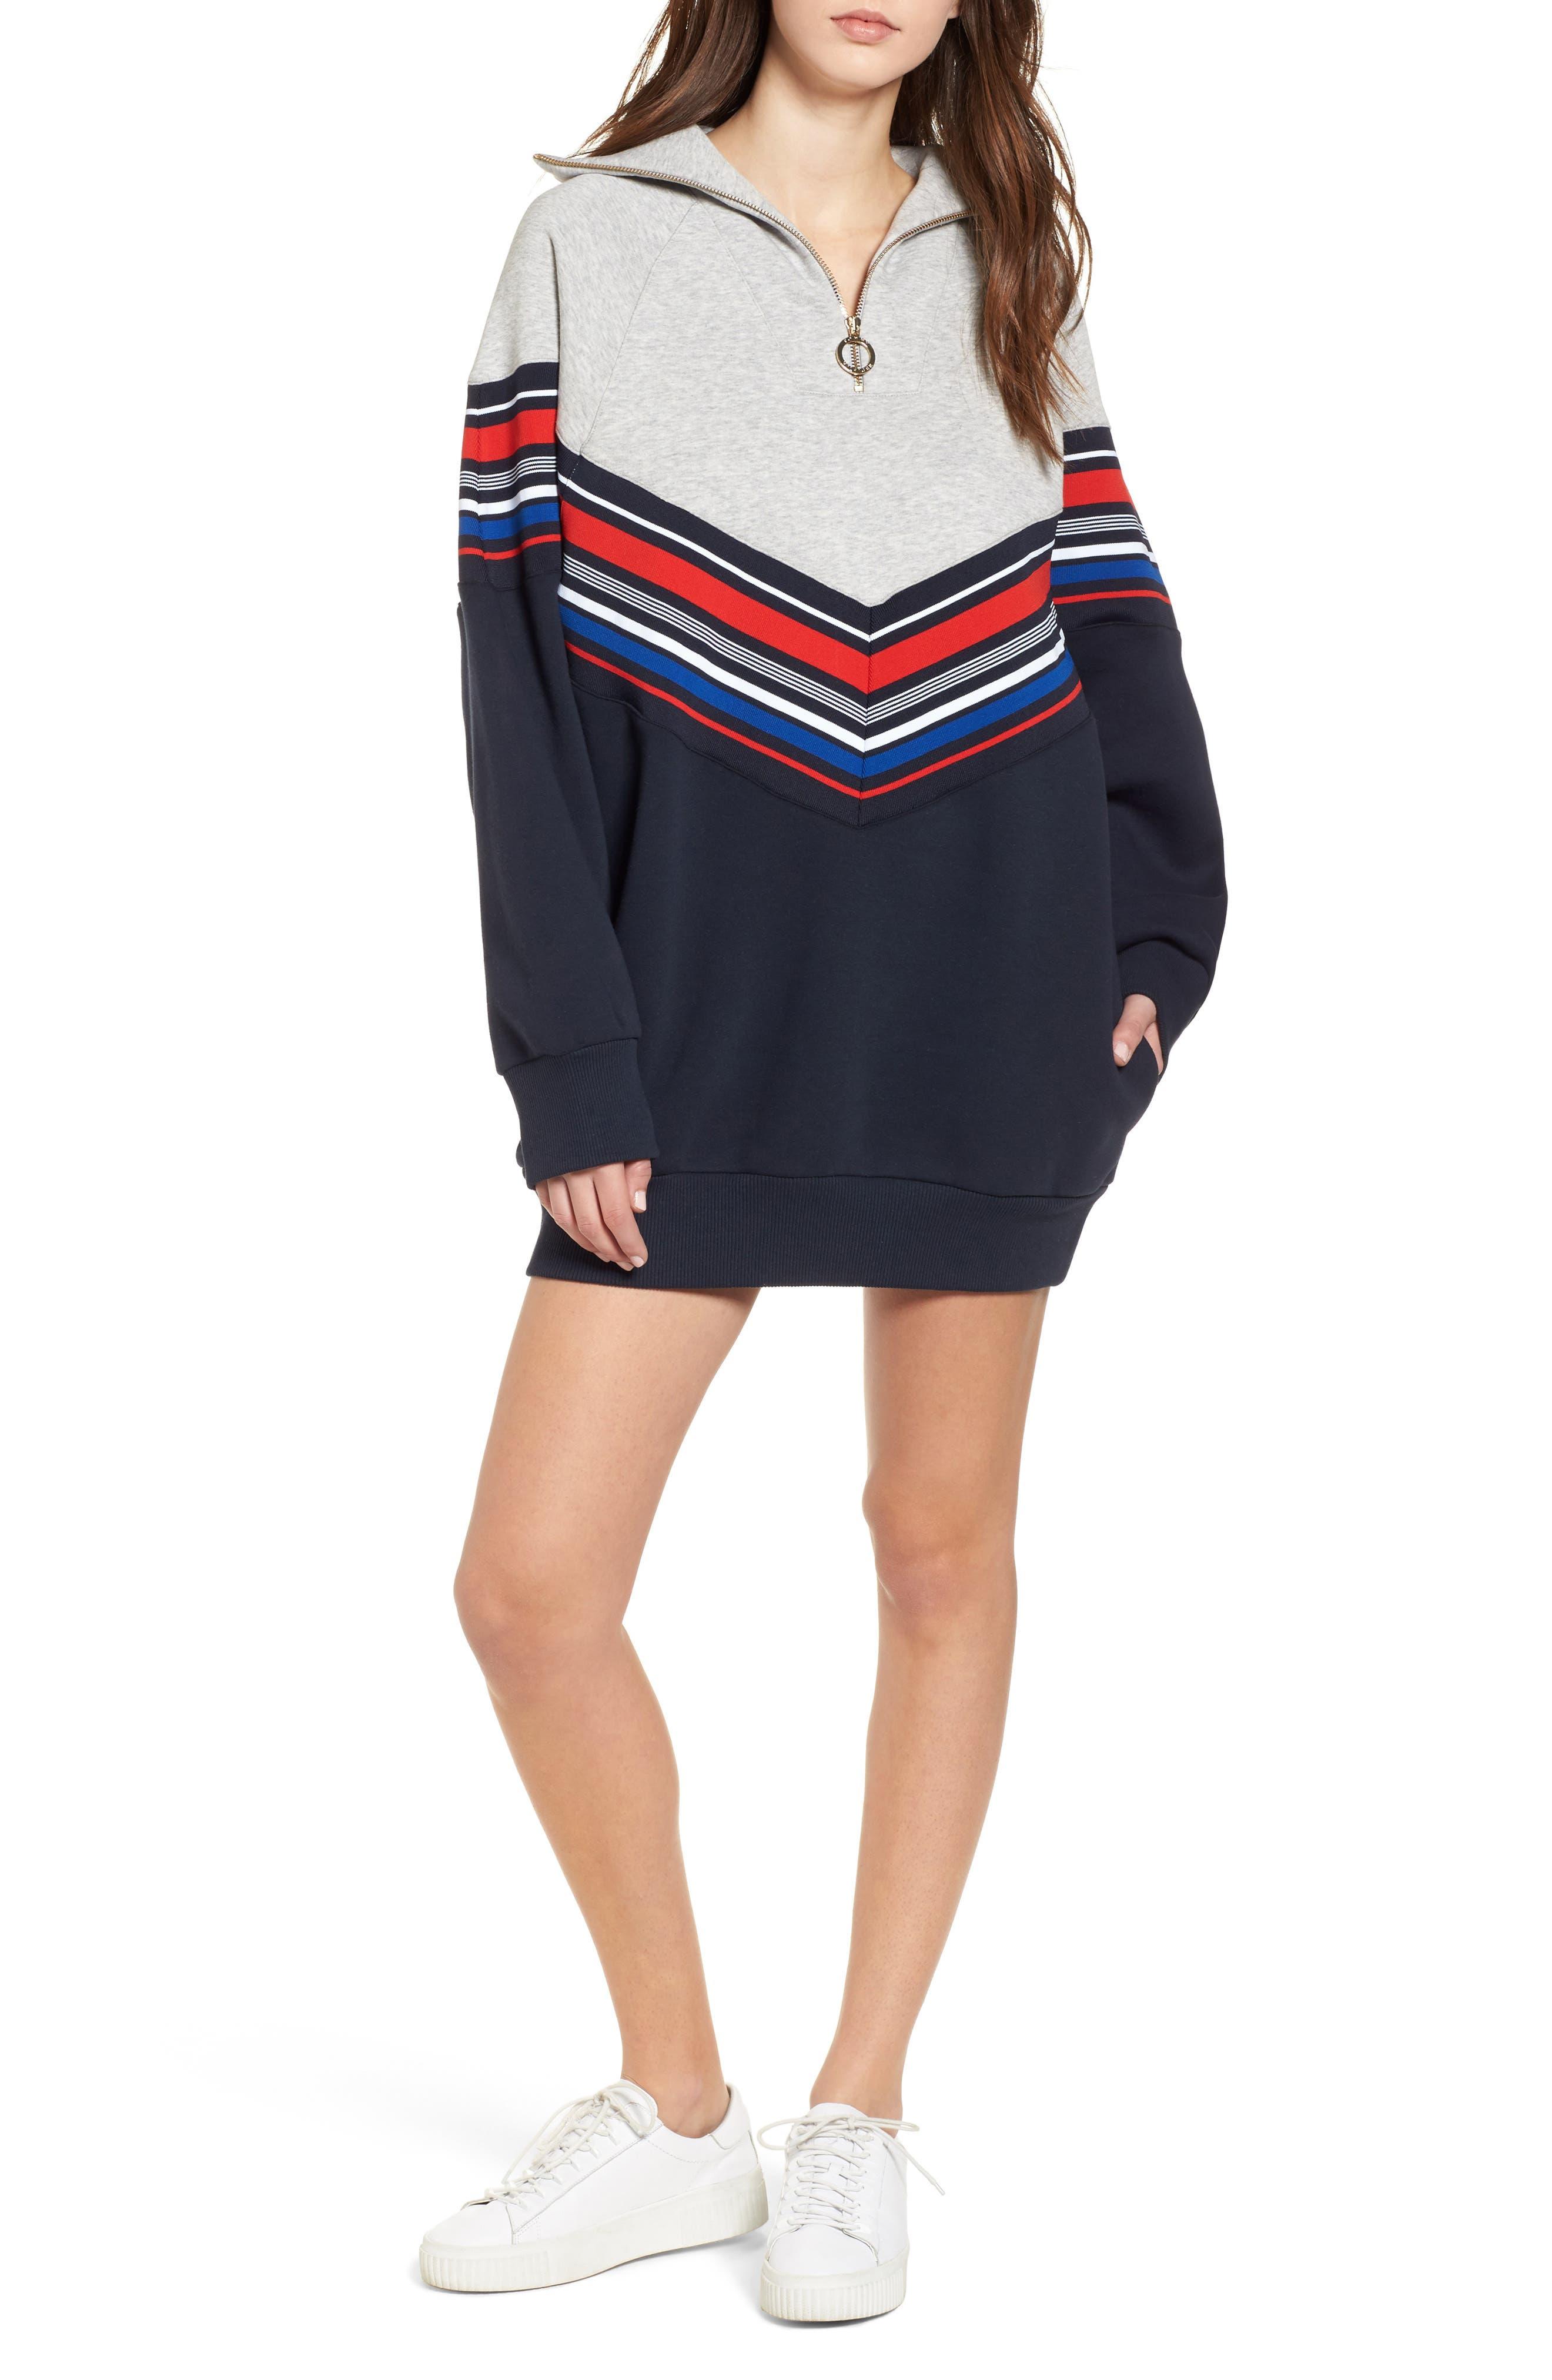 TOMMY JEANS x Gigi Hadid Racing Sweatshirt Dress